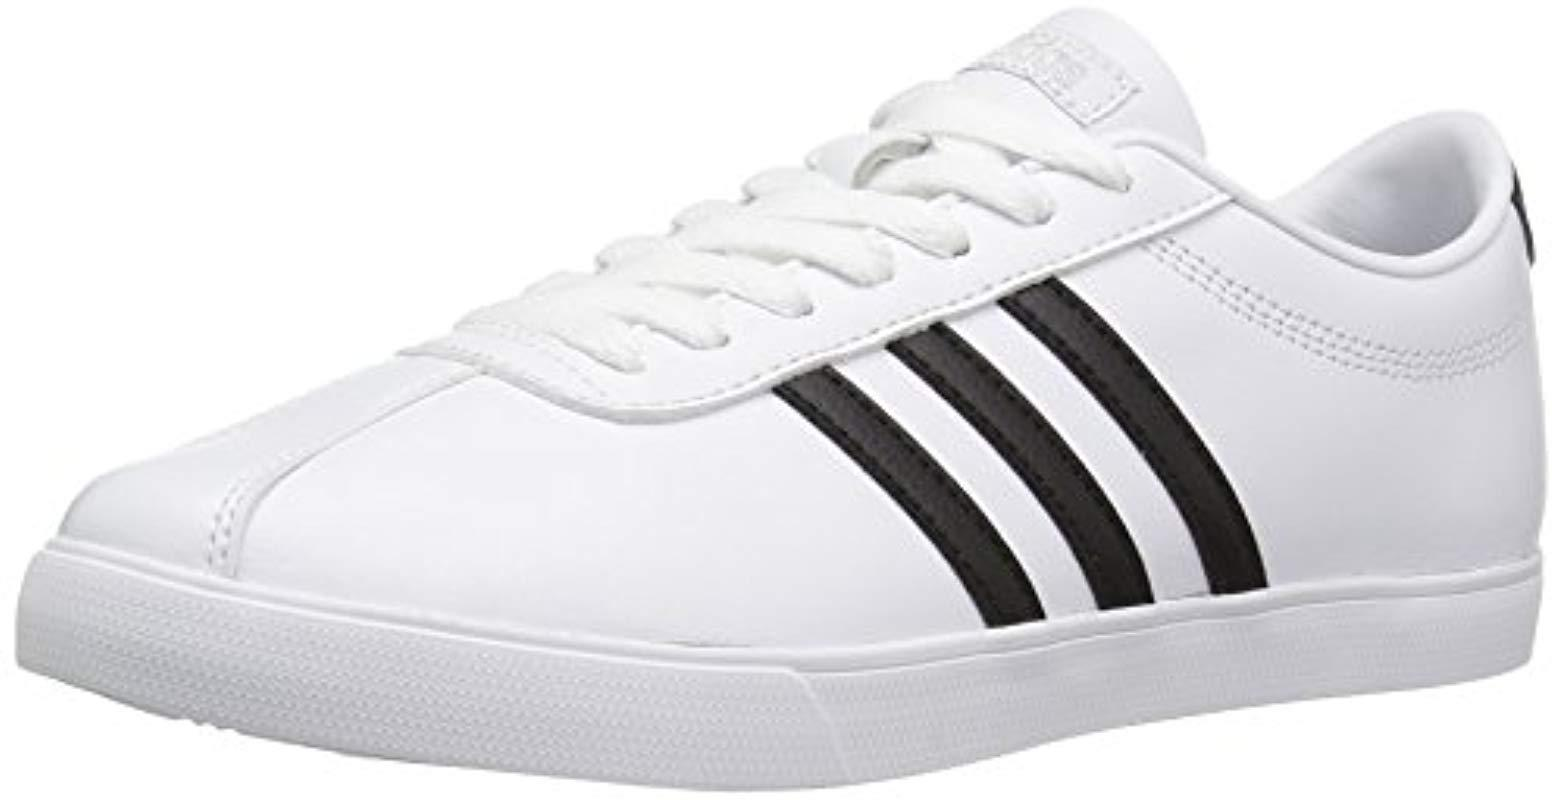 brand new 04c63 b4e63 adidas Originals. Men s Courtset Fashion Sneakers